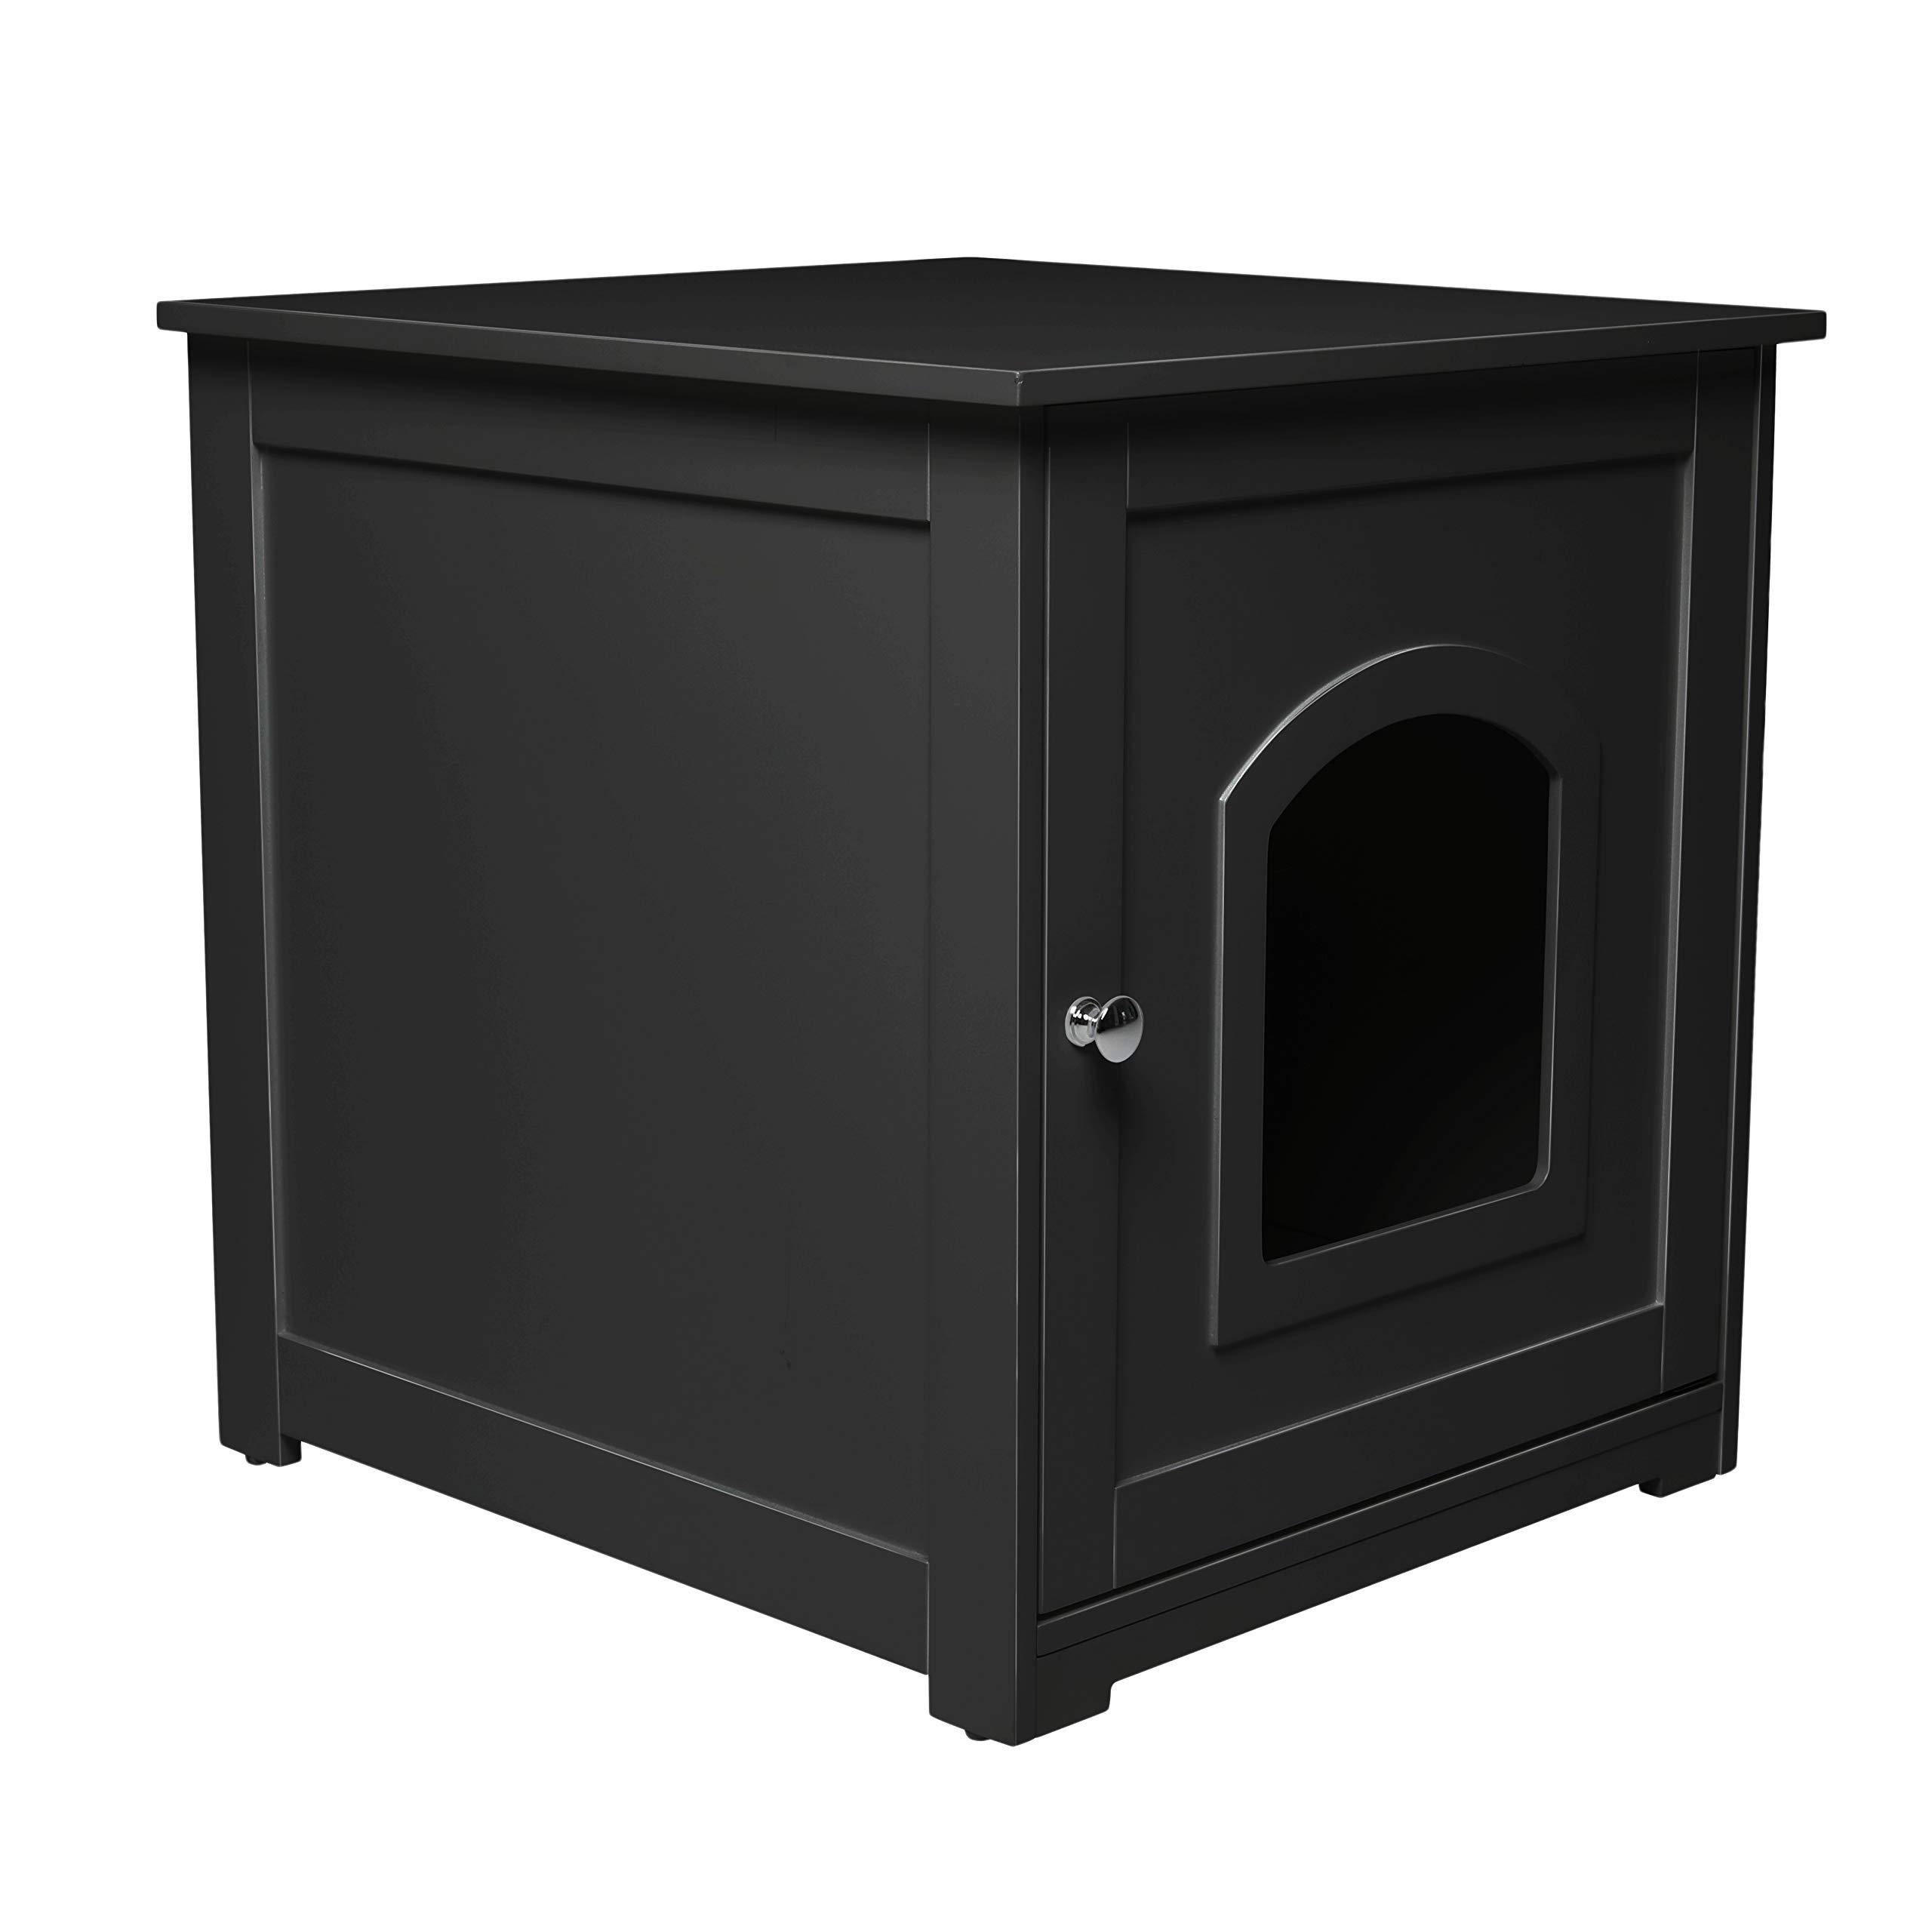 zoovilla Kitty Litter Loo - Hidden Litter Box Furniture, Black by zoovilla